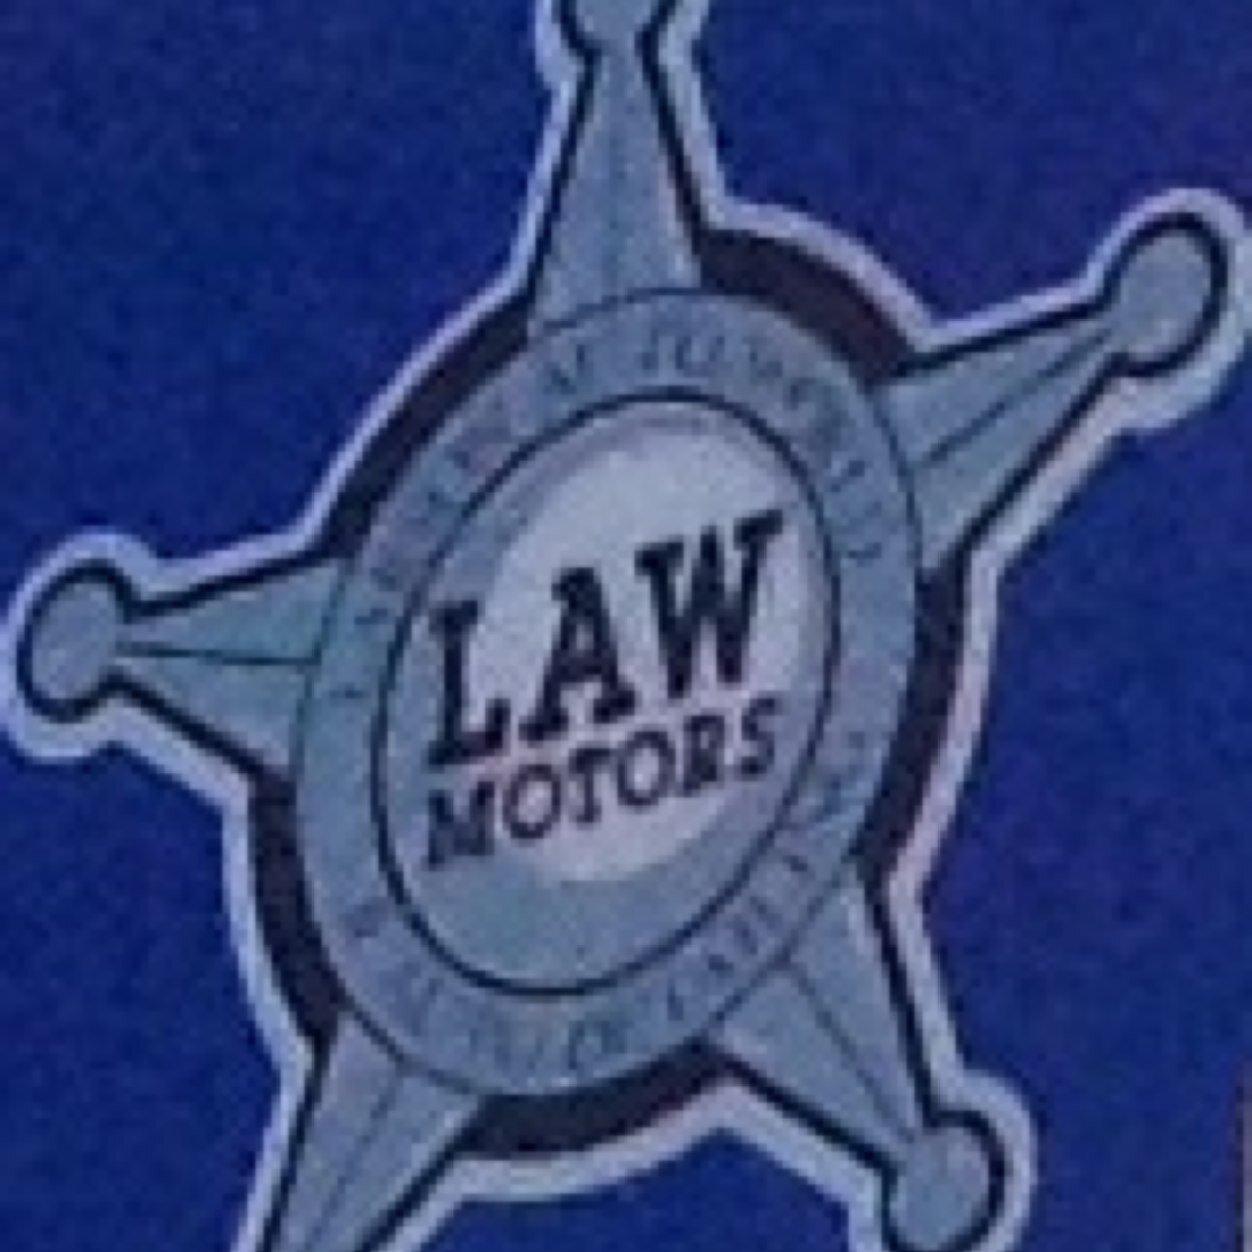 Law motors lawmotors twitter for Law motors sioux falls